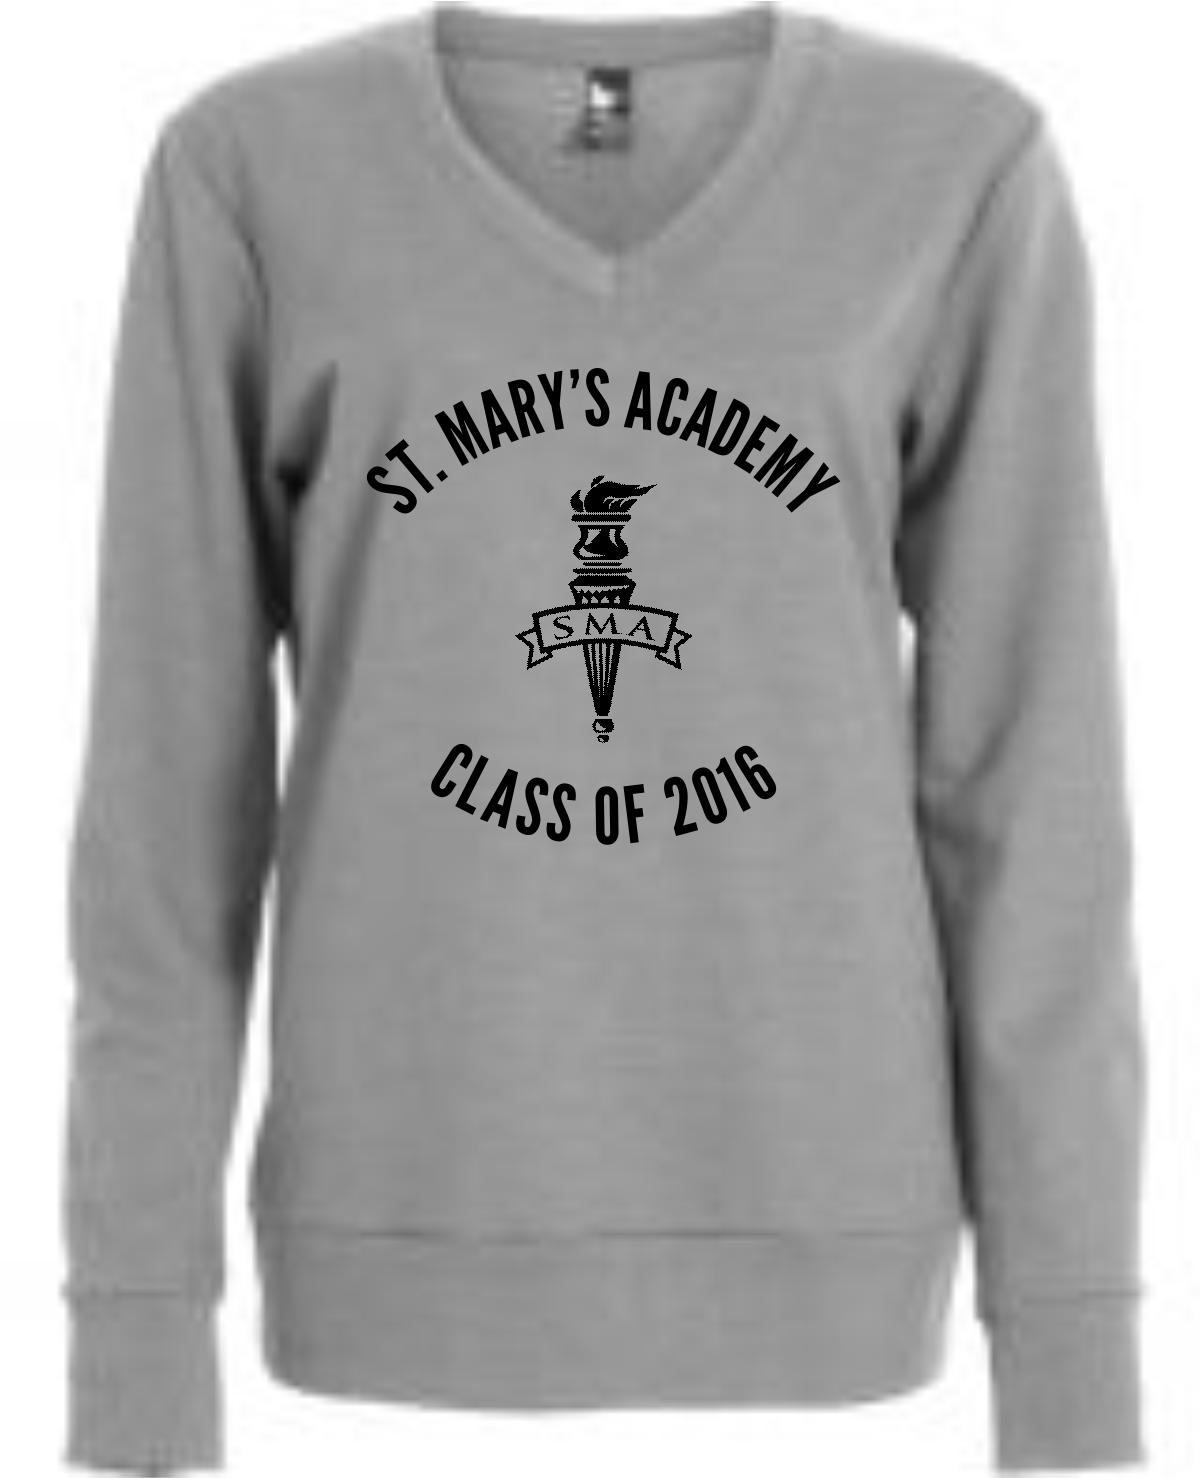 Custom School Apparel   Promotional Items - Printed Shirts - Printed ... adad89076